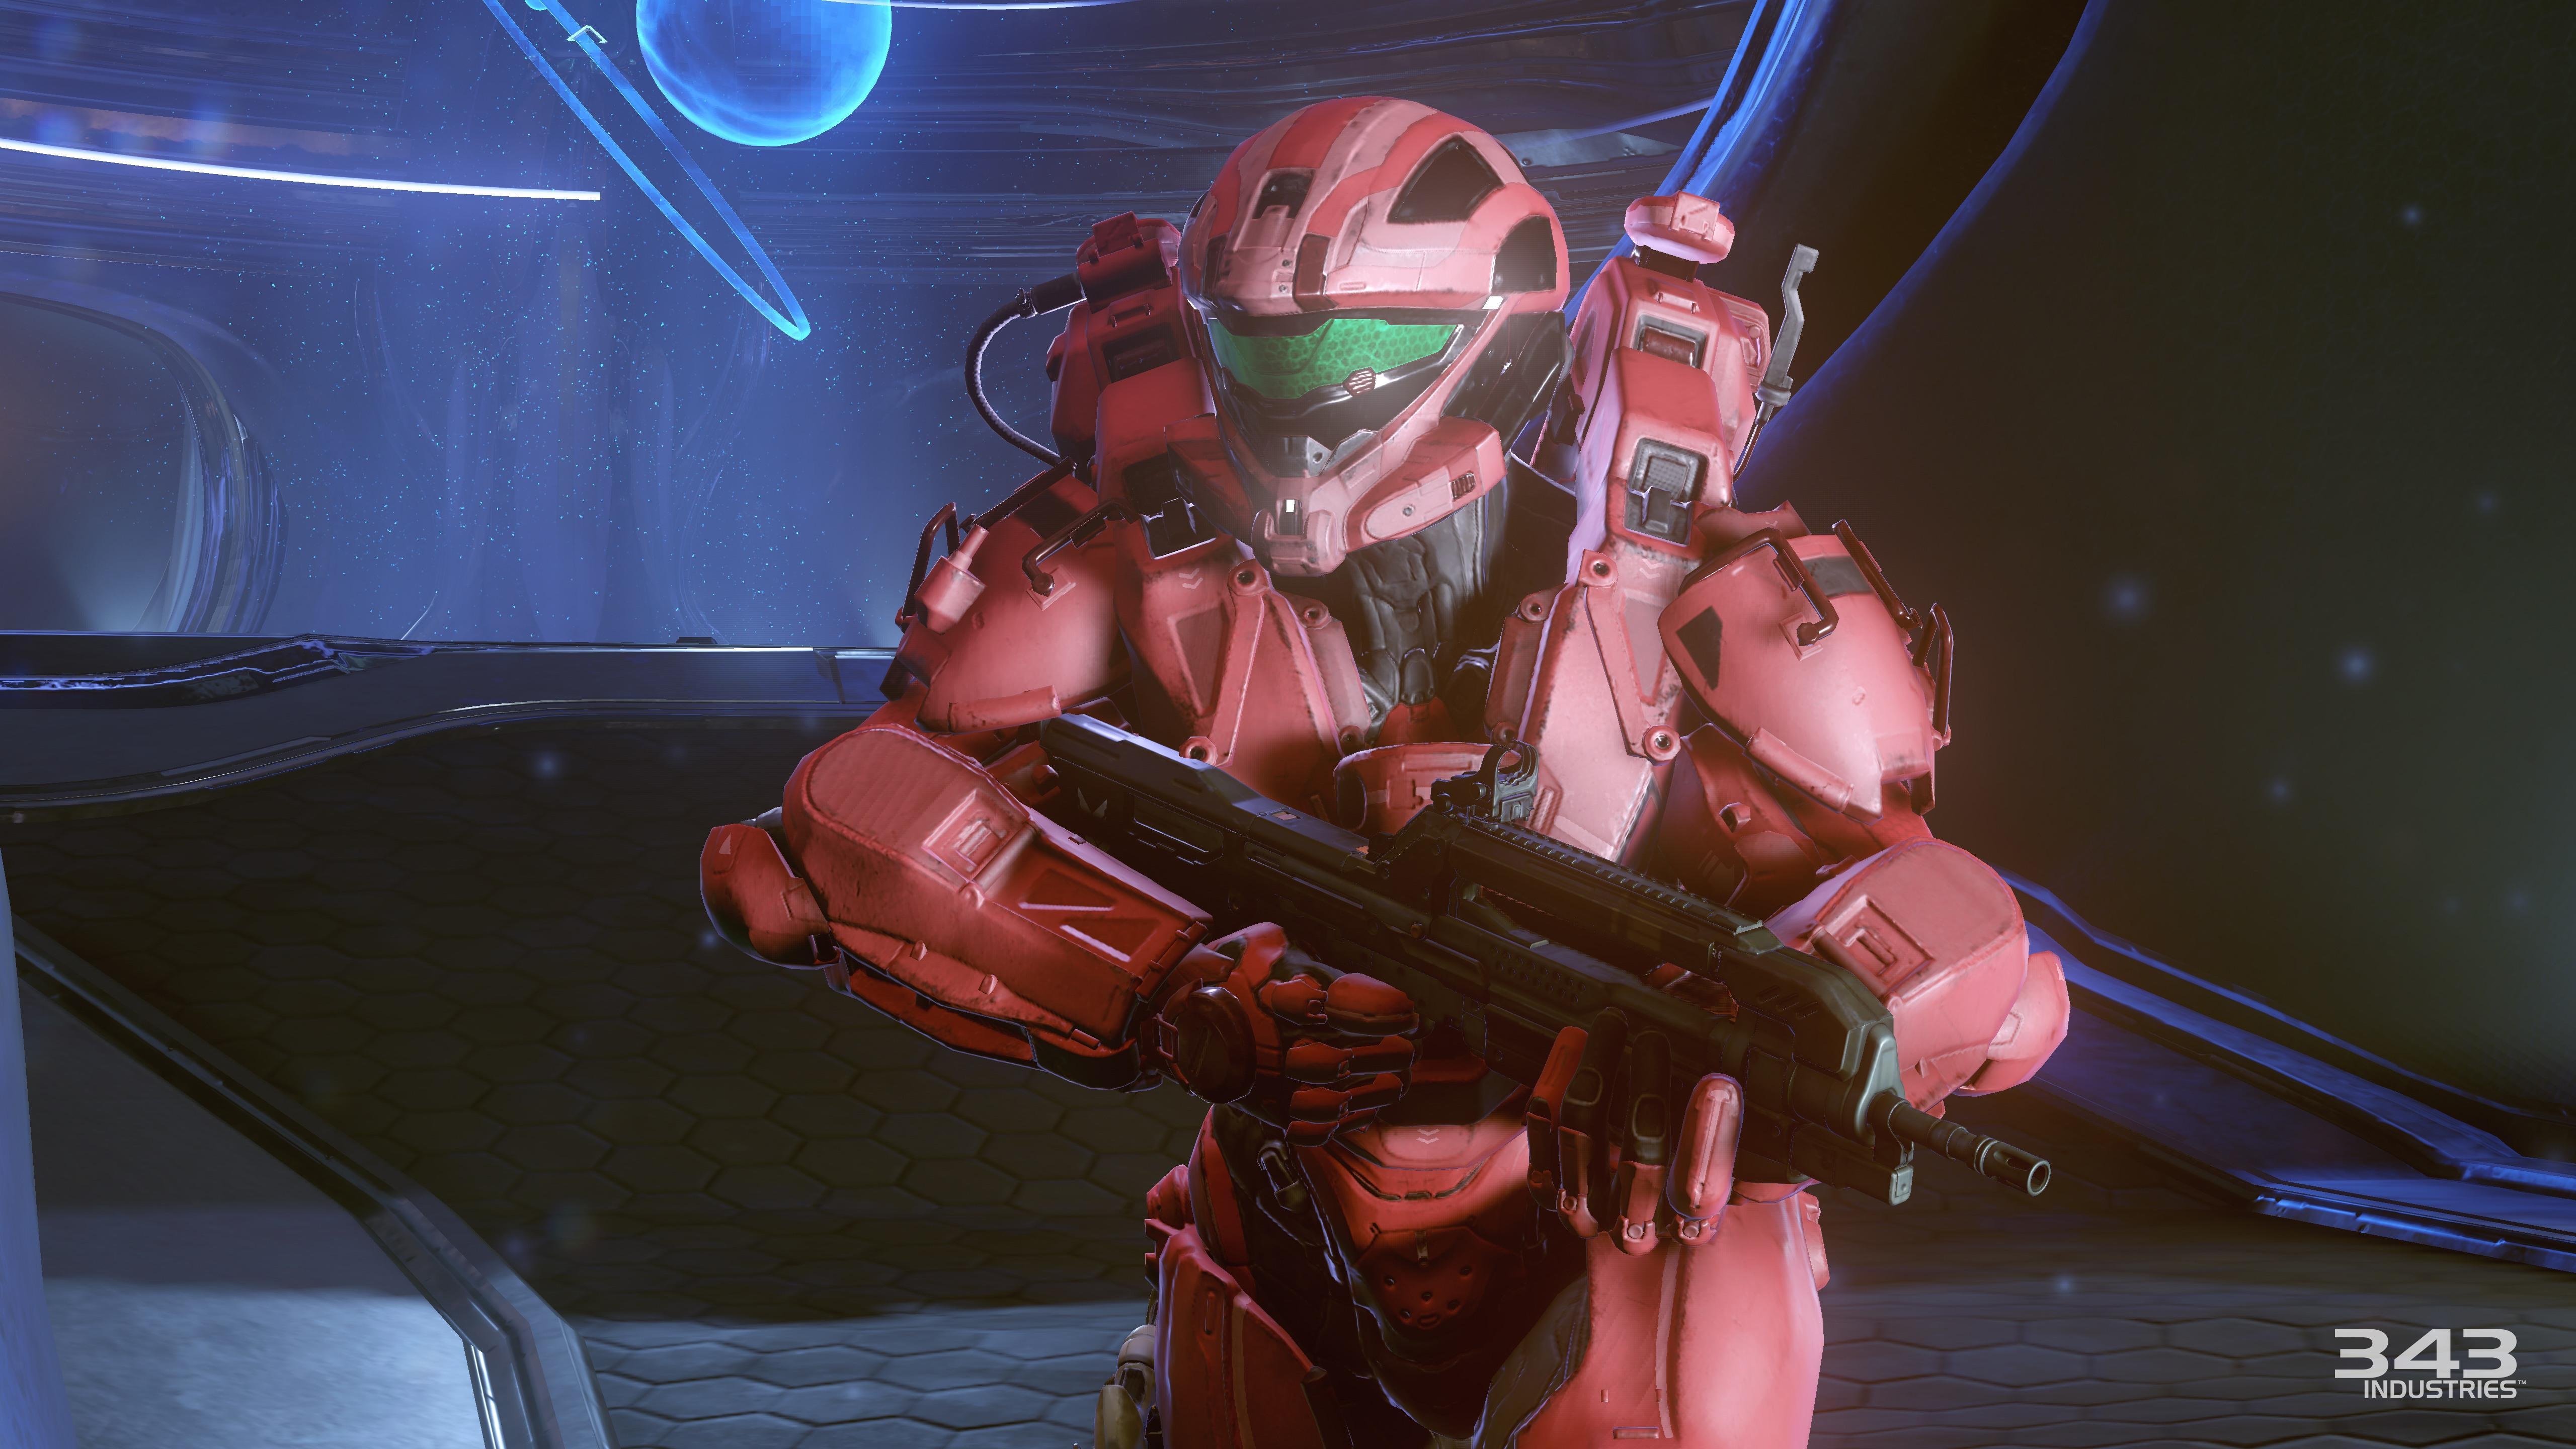 Minecraft Skins Halo 5 Guardians